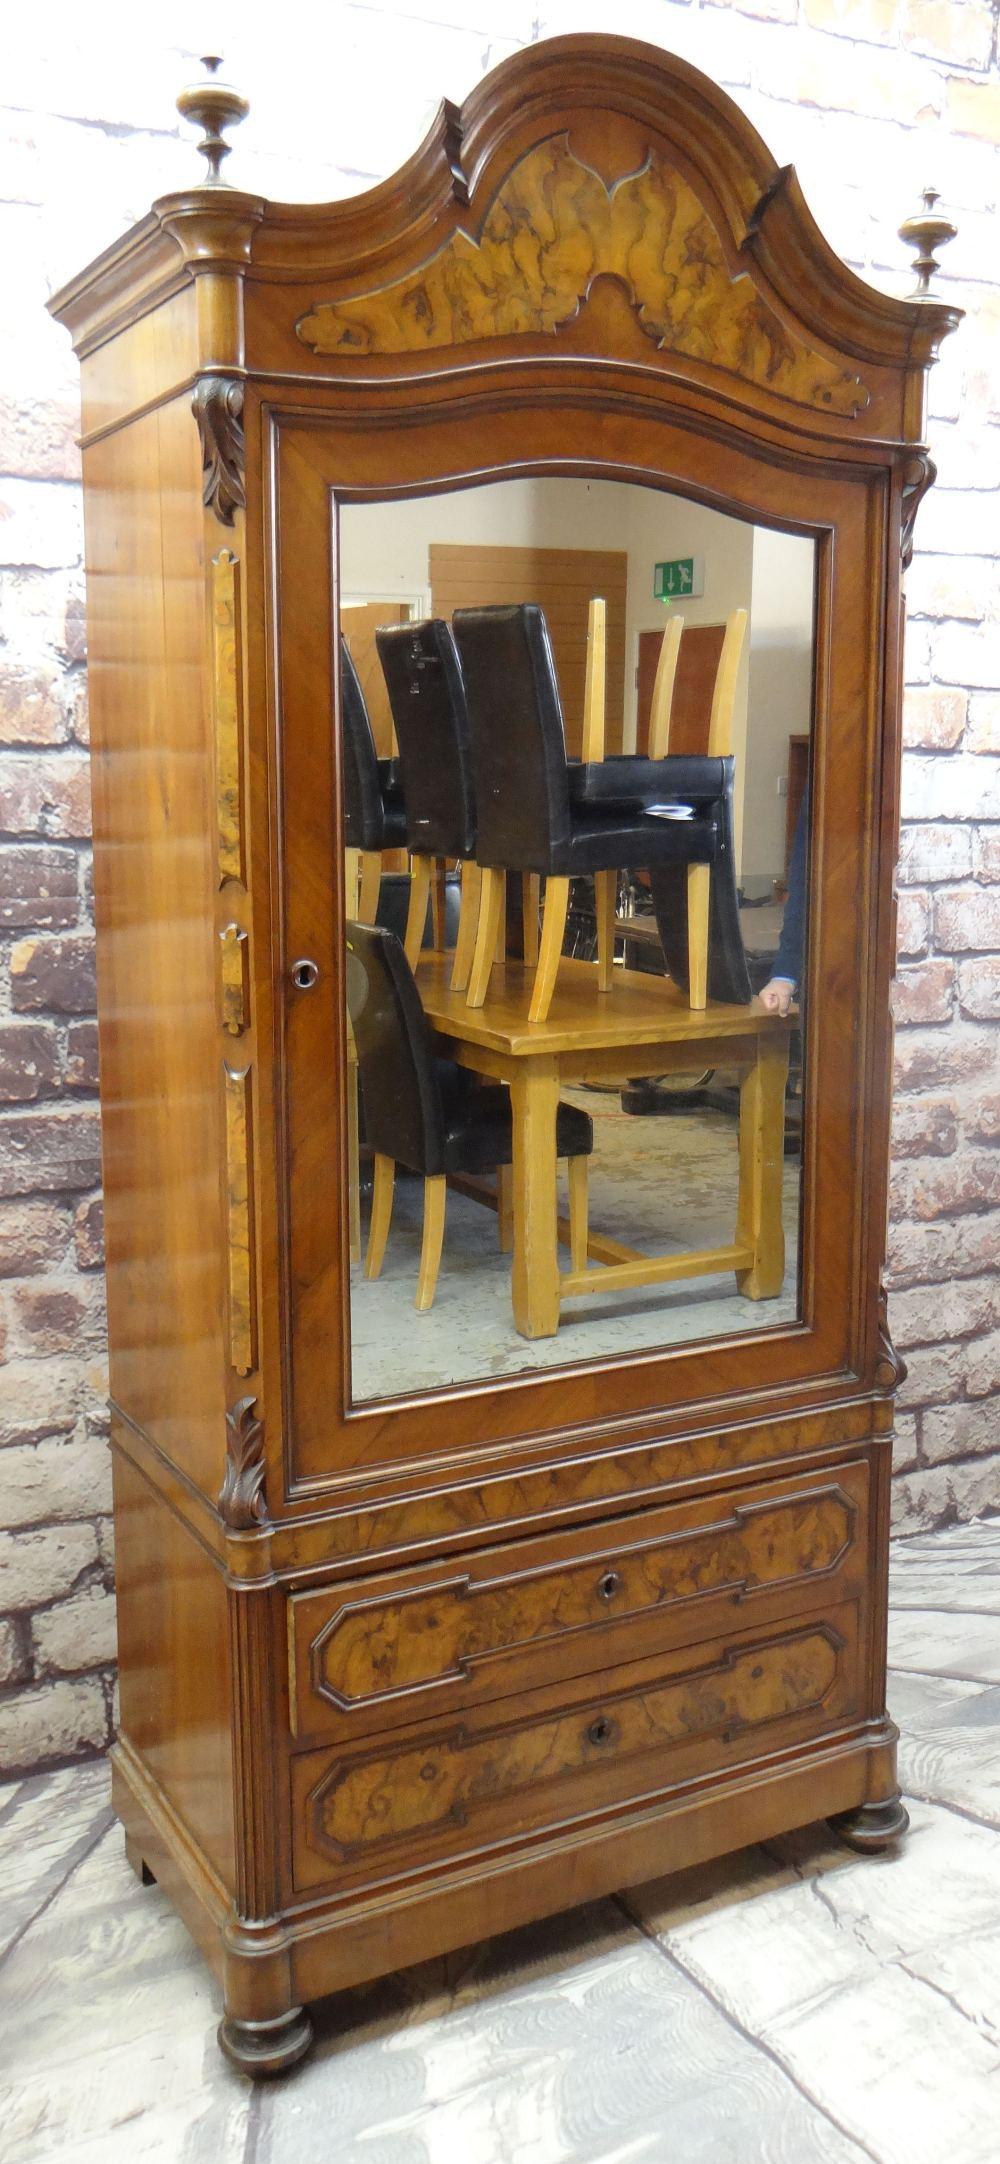 STYLISH FRENCH WALNUT & BURR WALNUT ARMOIRE, arched cornice with turned finials, mirror-glazed - Image 2 of 7